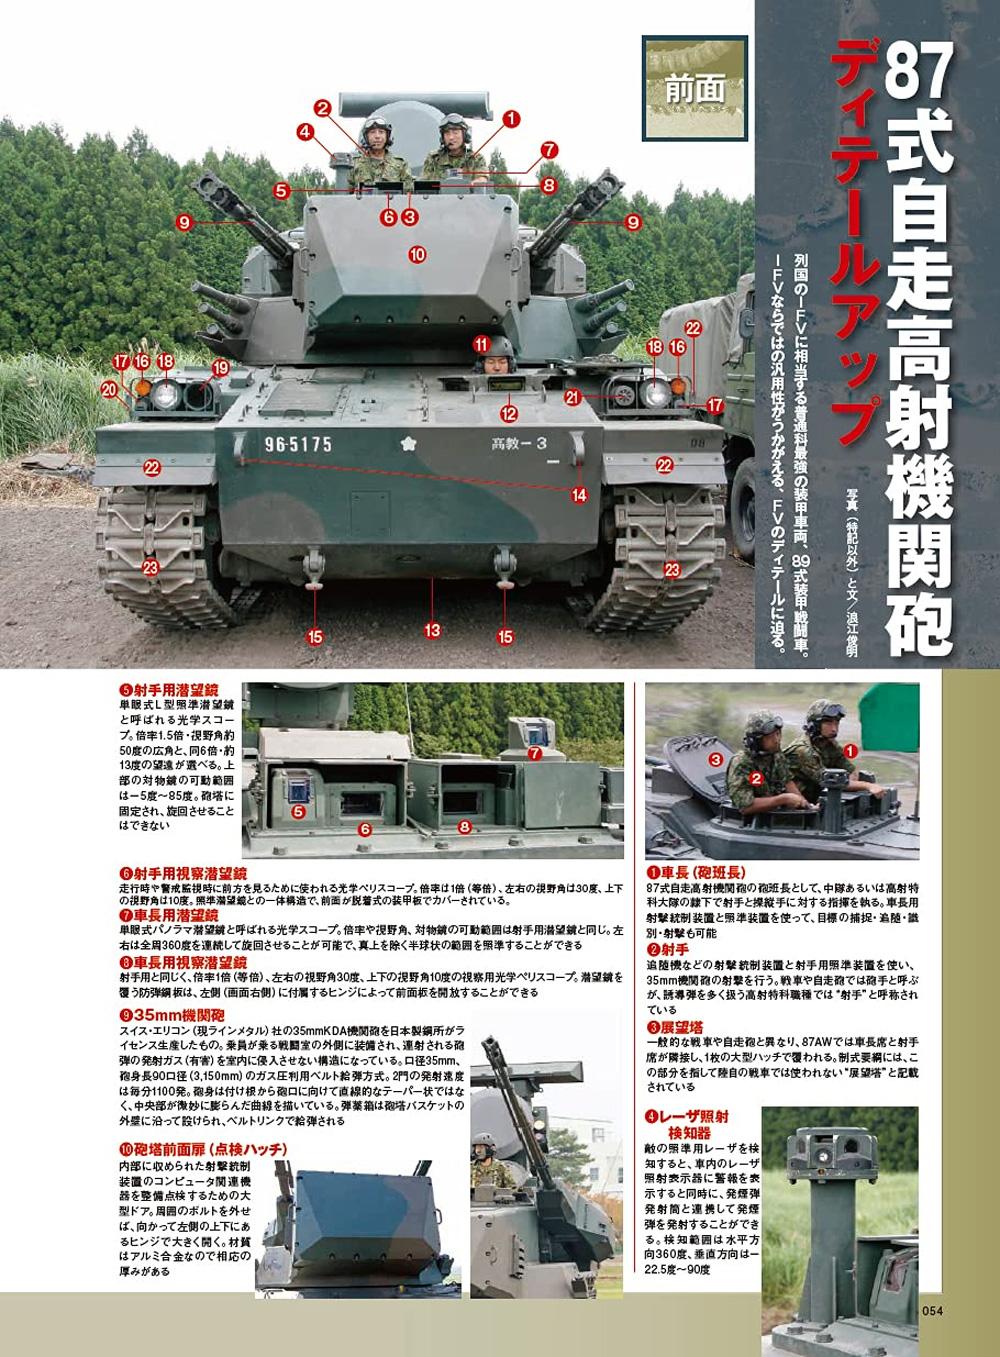 Jグランド EX 2021 SUMMER No.13雑誌(イカロス出版JグランドNo.013)商品画像_4